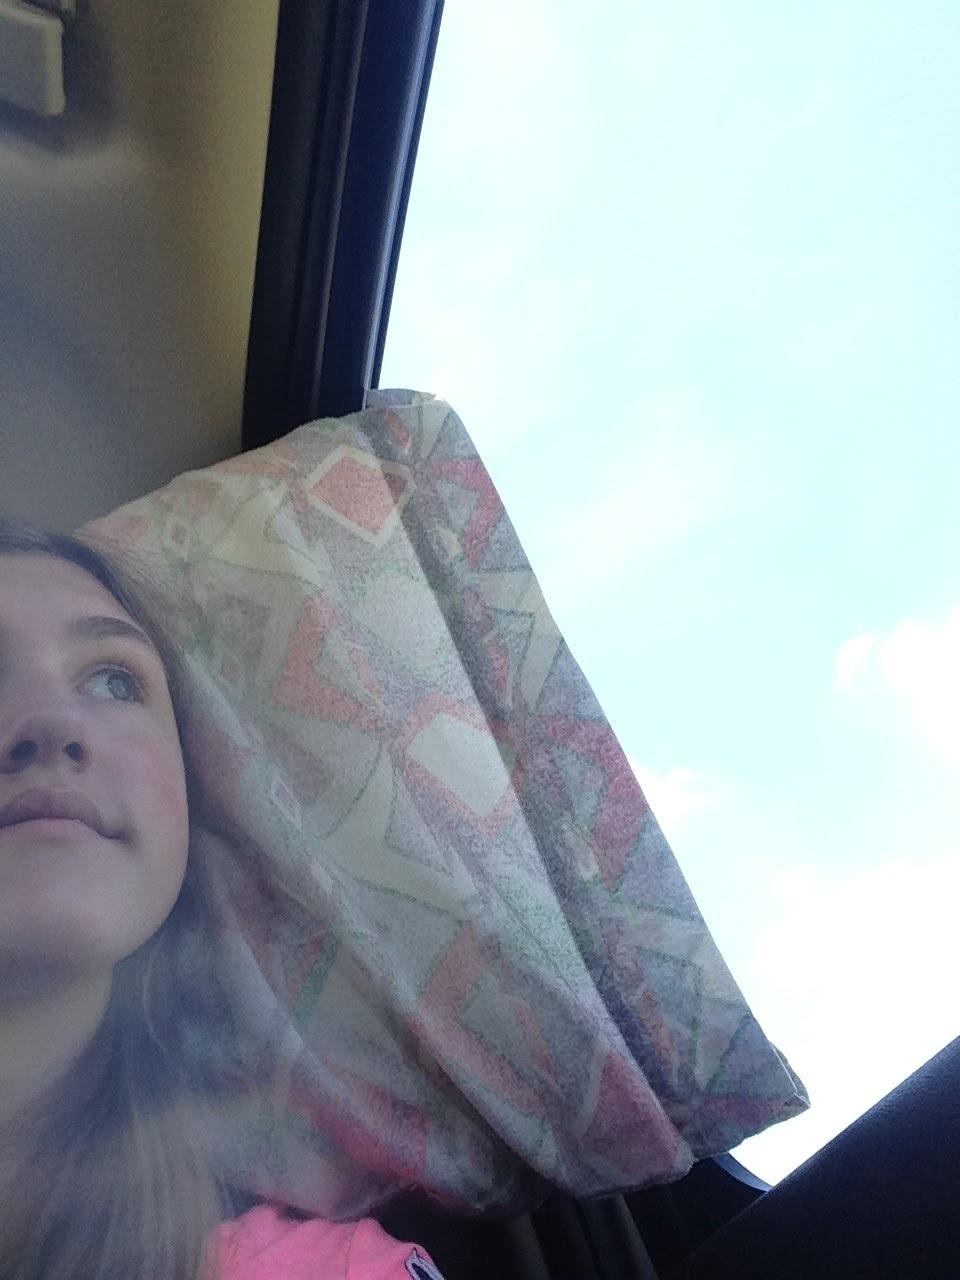 Ashlee-Looking-Out-Window.jpg